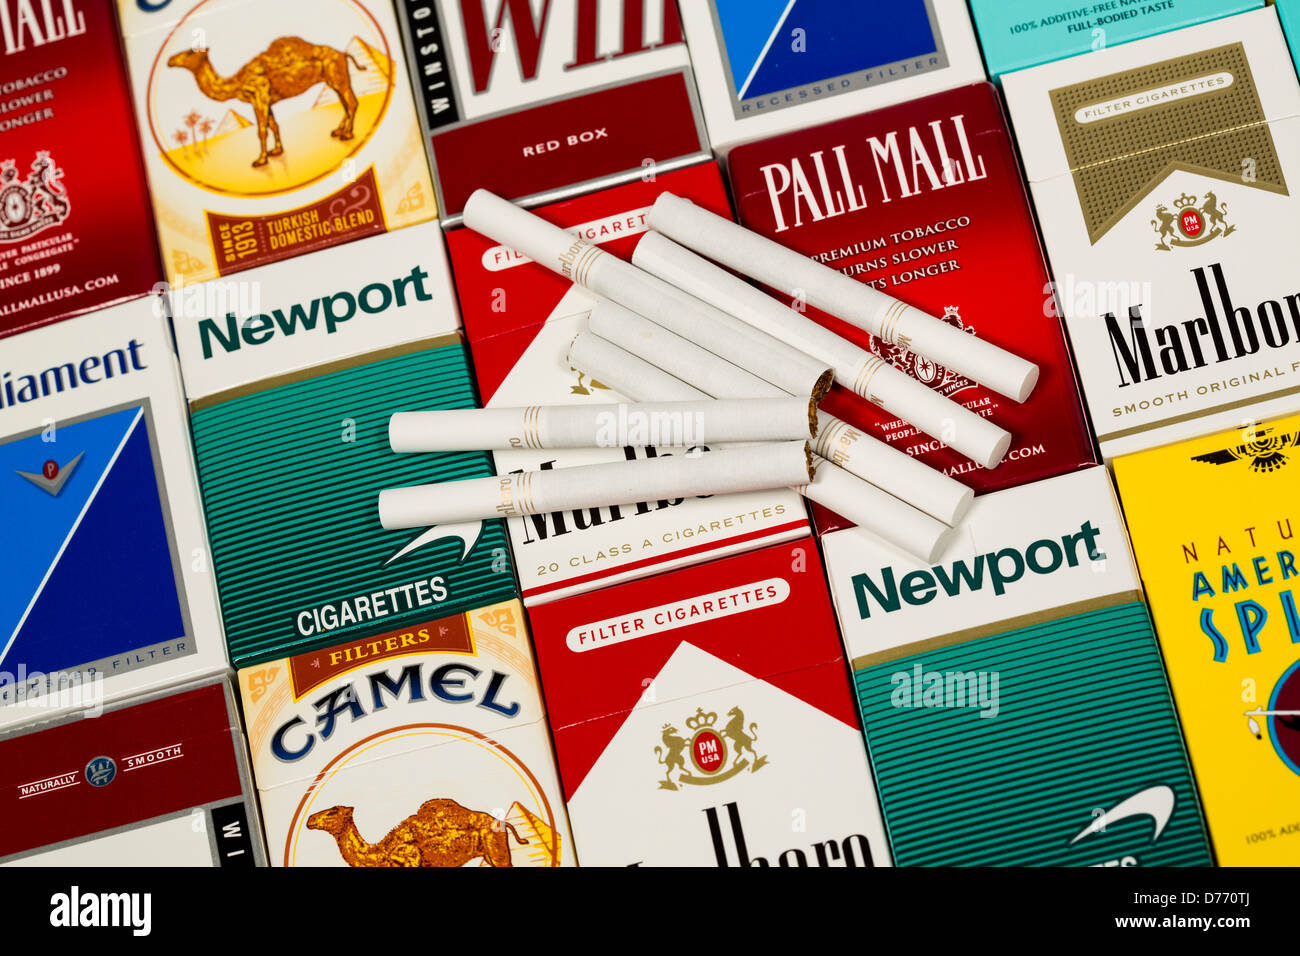 Buy double diamond cigarettes Camel